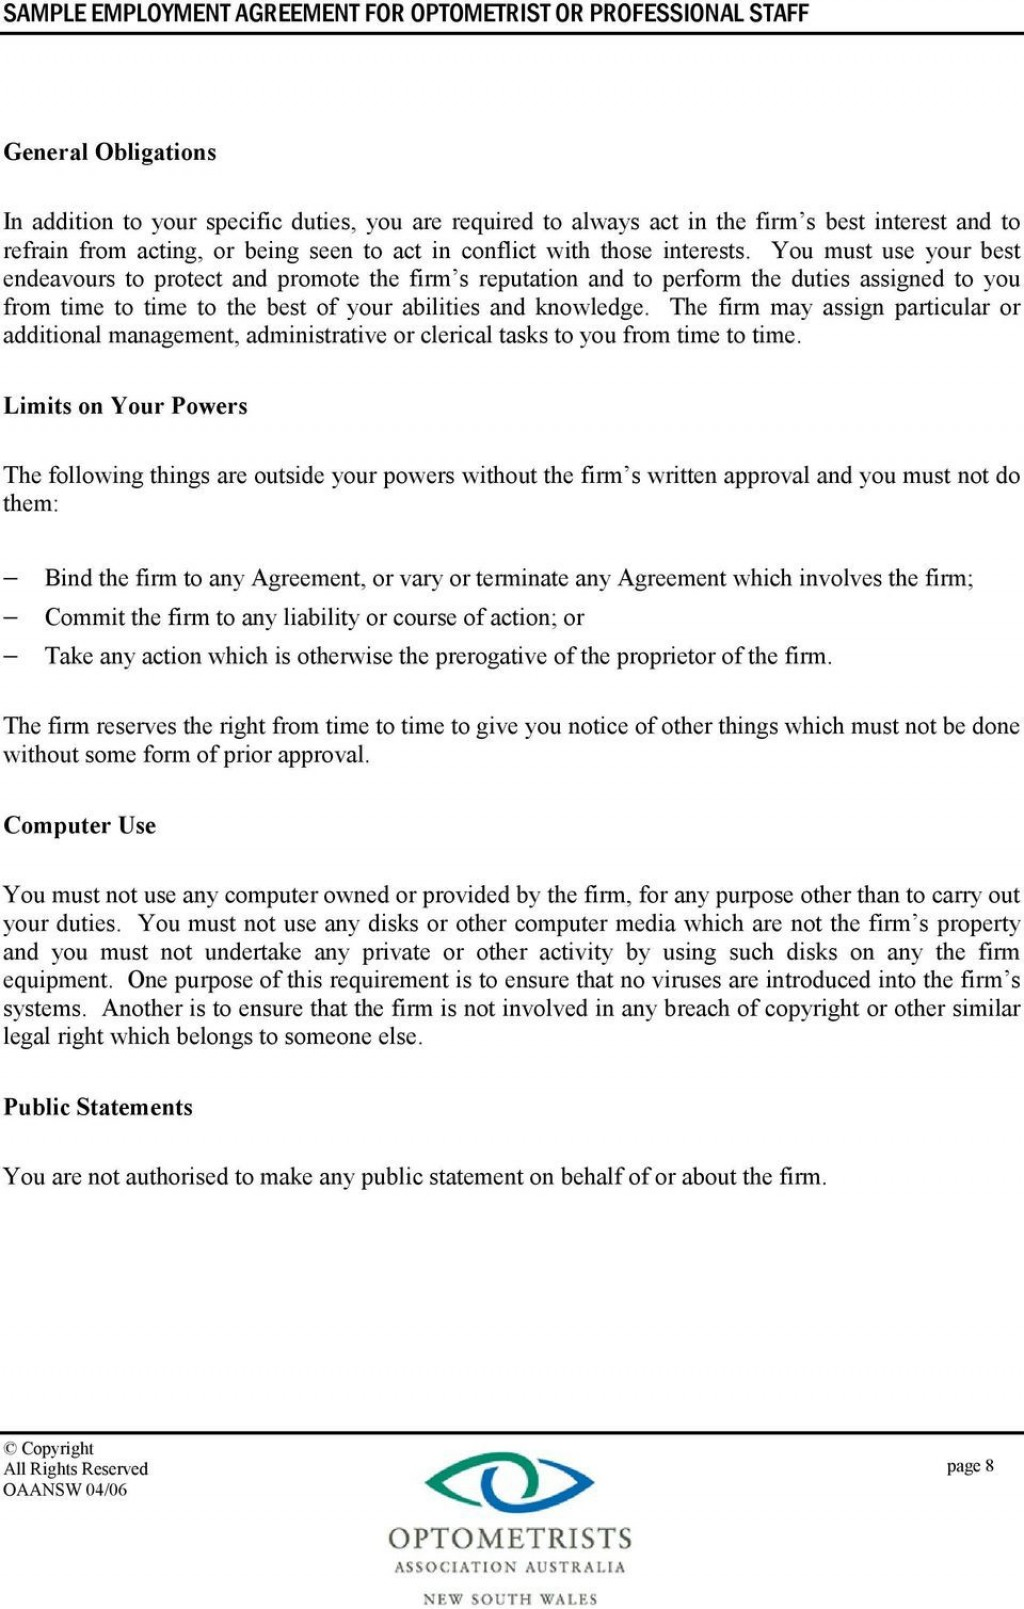 007 Wondrou Free Casual Employment Contract Template Australia Sample Large